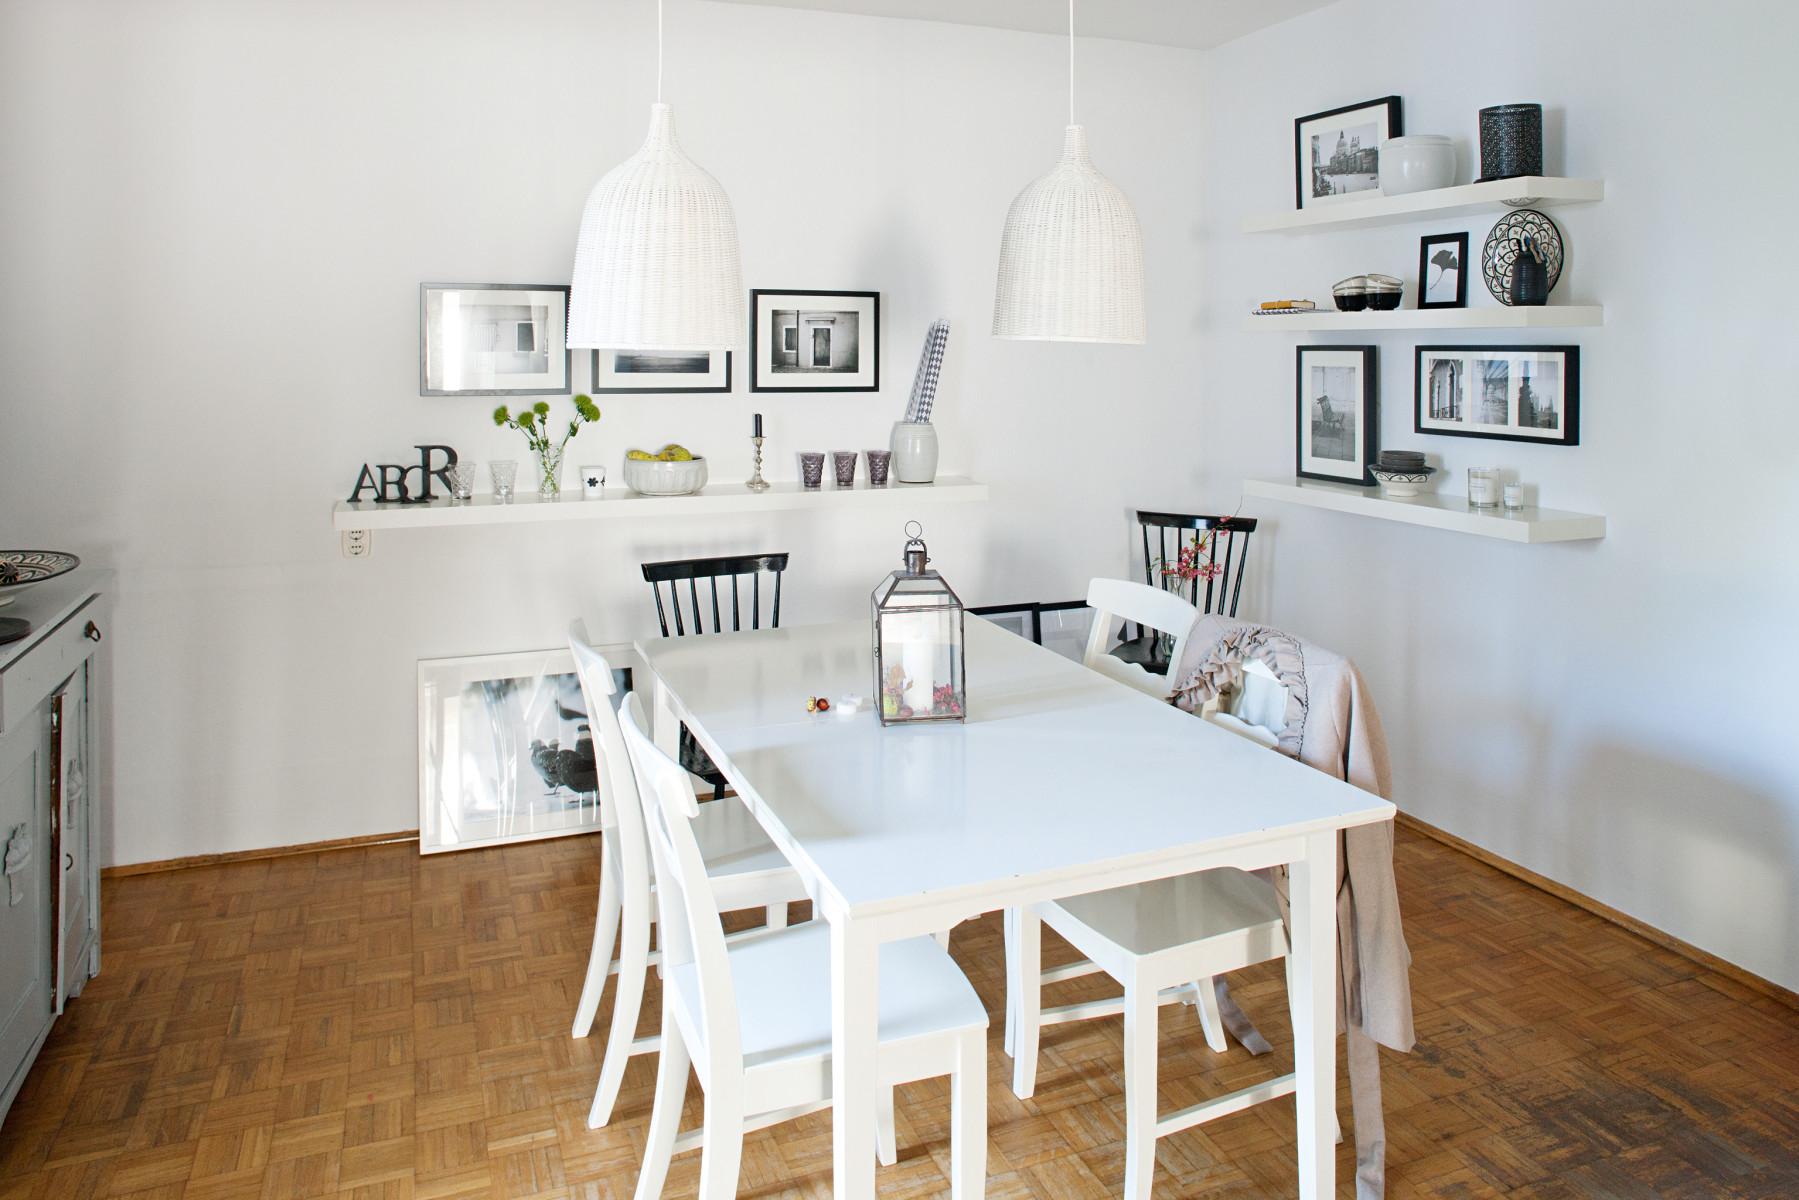 Kreative leidenschaft for Wohnungseinrichtung inspiration